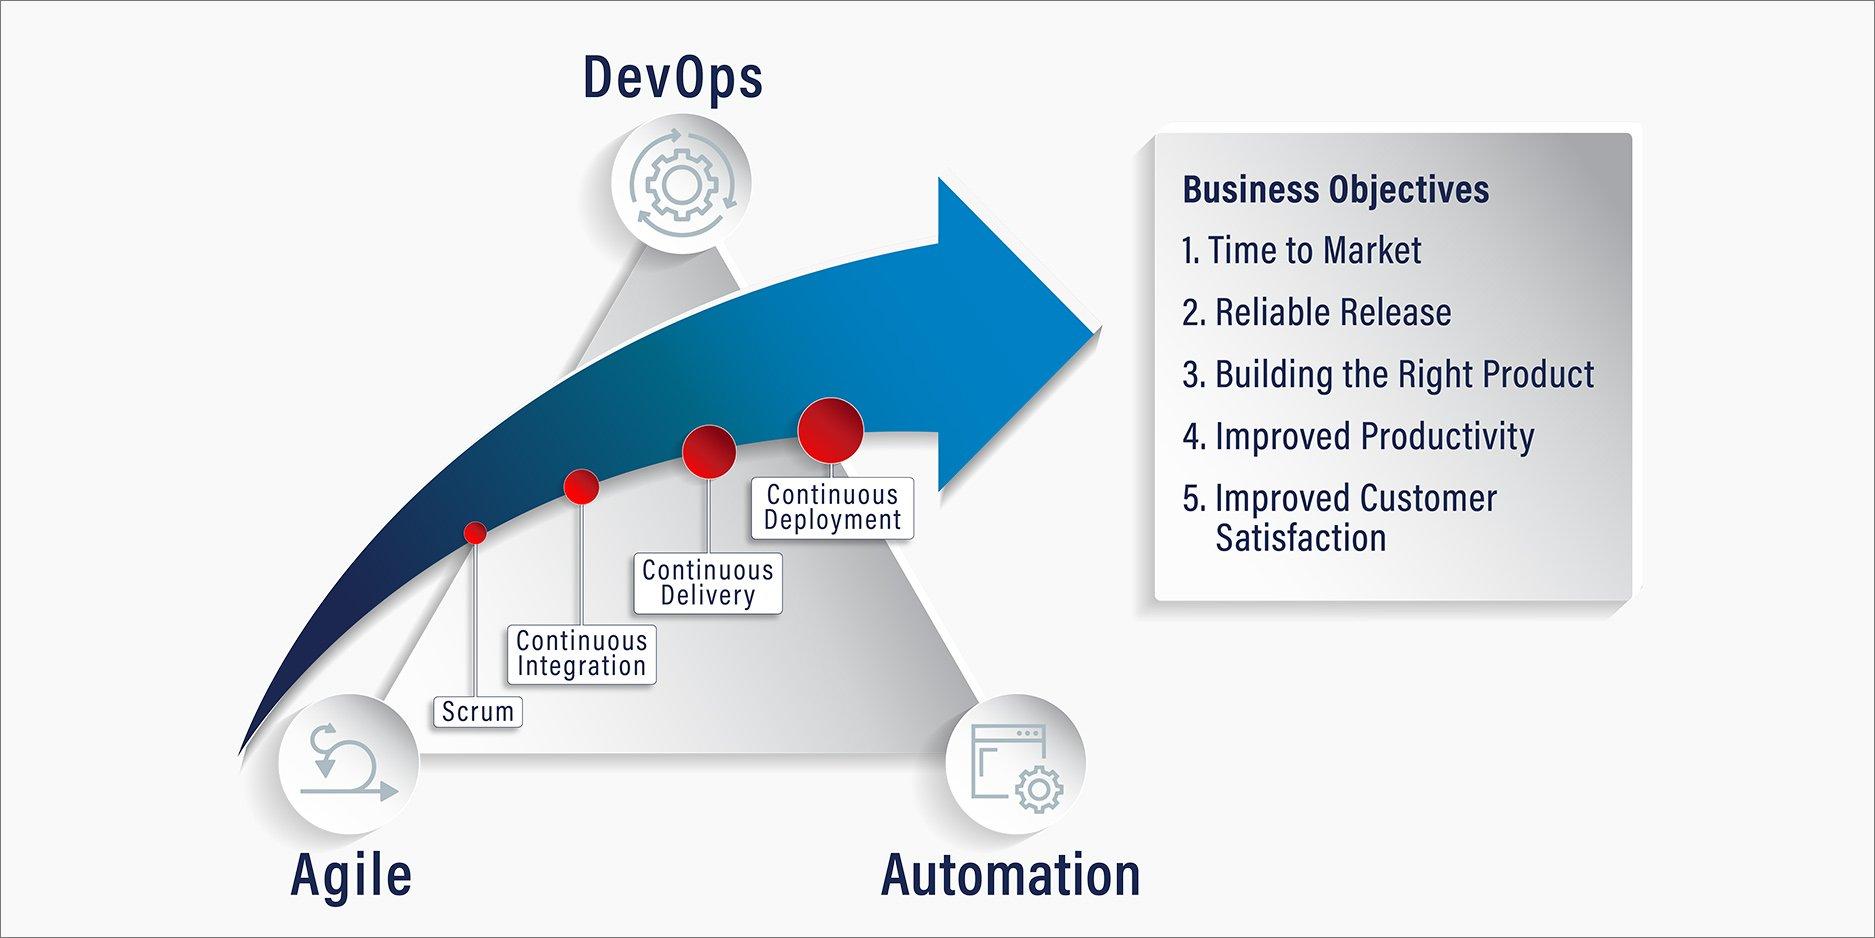 DevOps infographic